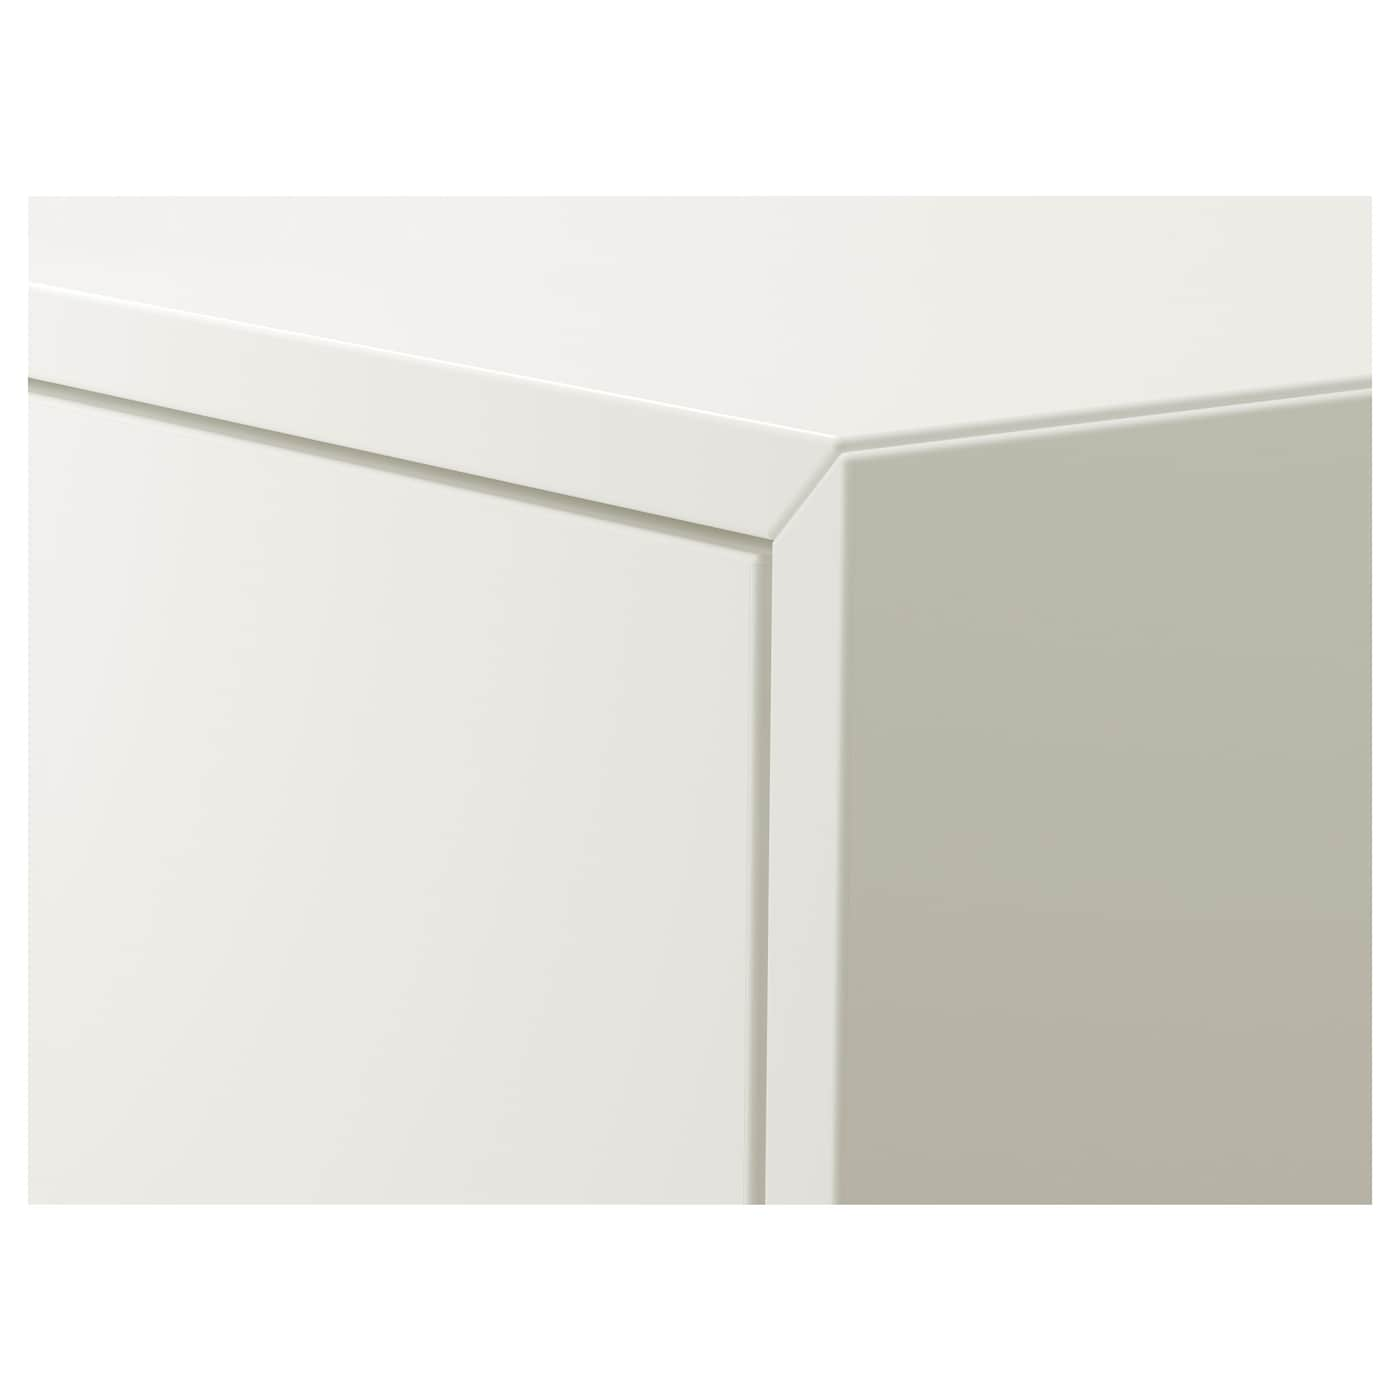 EKET Wall-mounted cabinet combination, white/dark grey/light grey, 80x35x210 cm